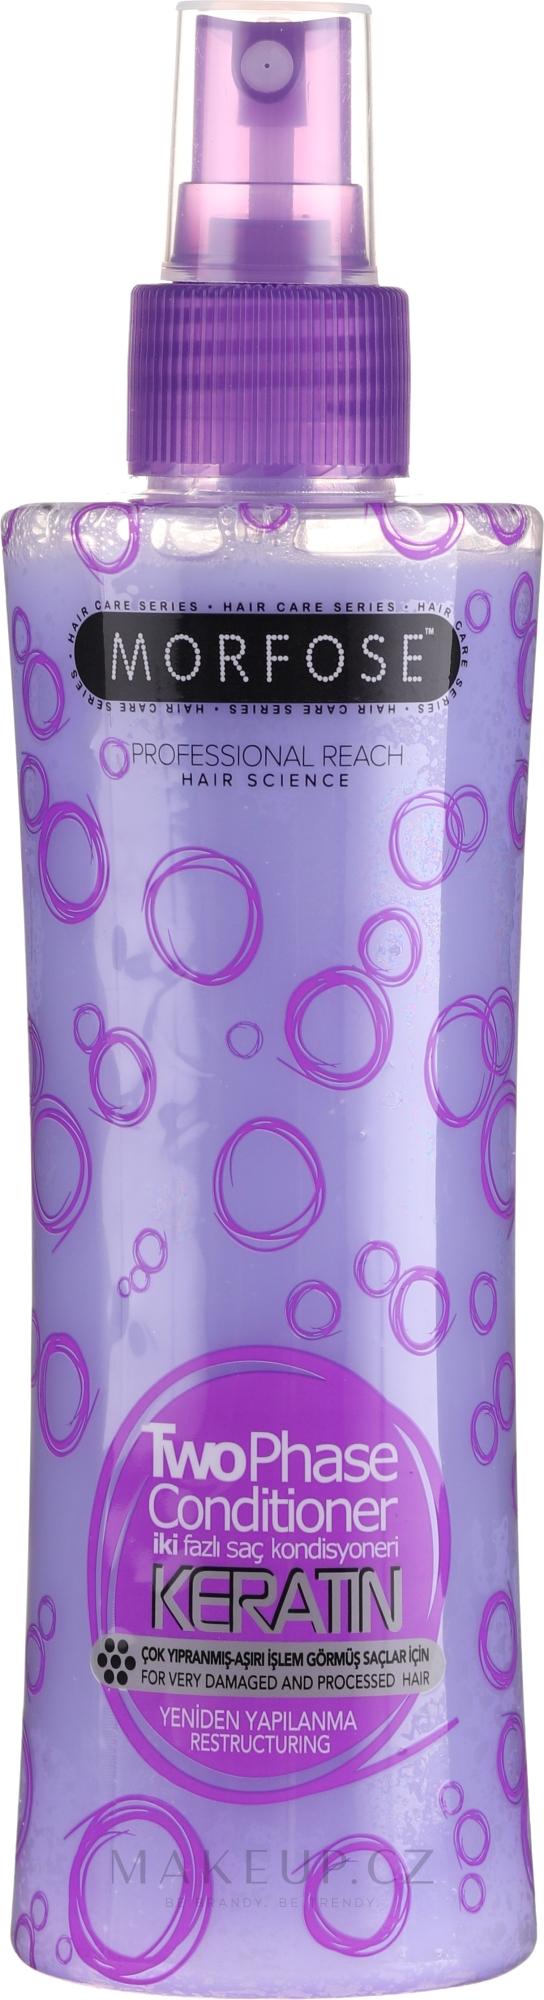 Dvoufázový kondicionér na vlasy - Morfose Buble Keratin Conditioner — foto 220 ml